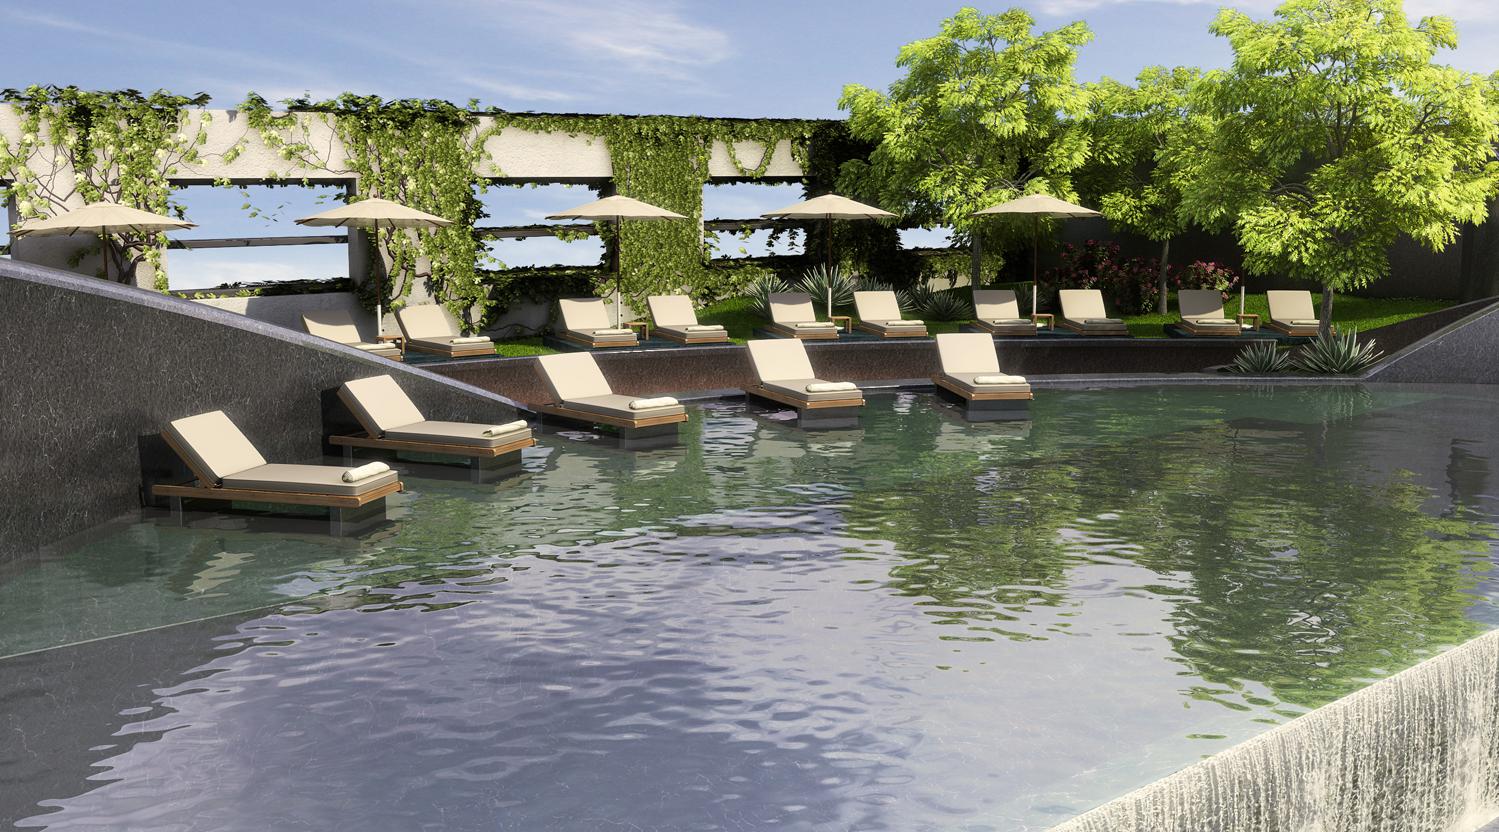 Park Hyatt Chennai Poolluxury News Best Of Luxury Interviews Event Calendar